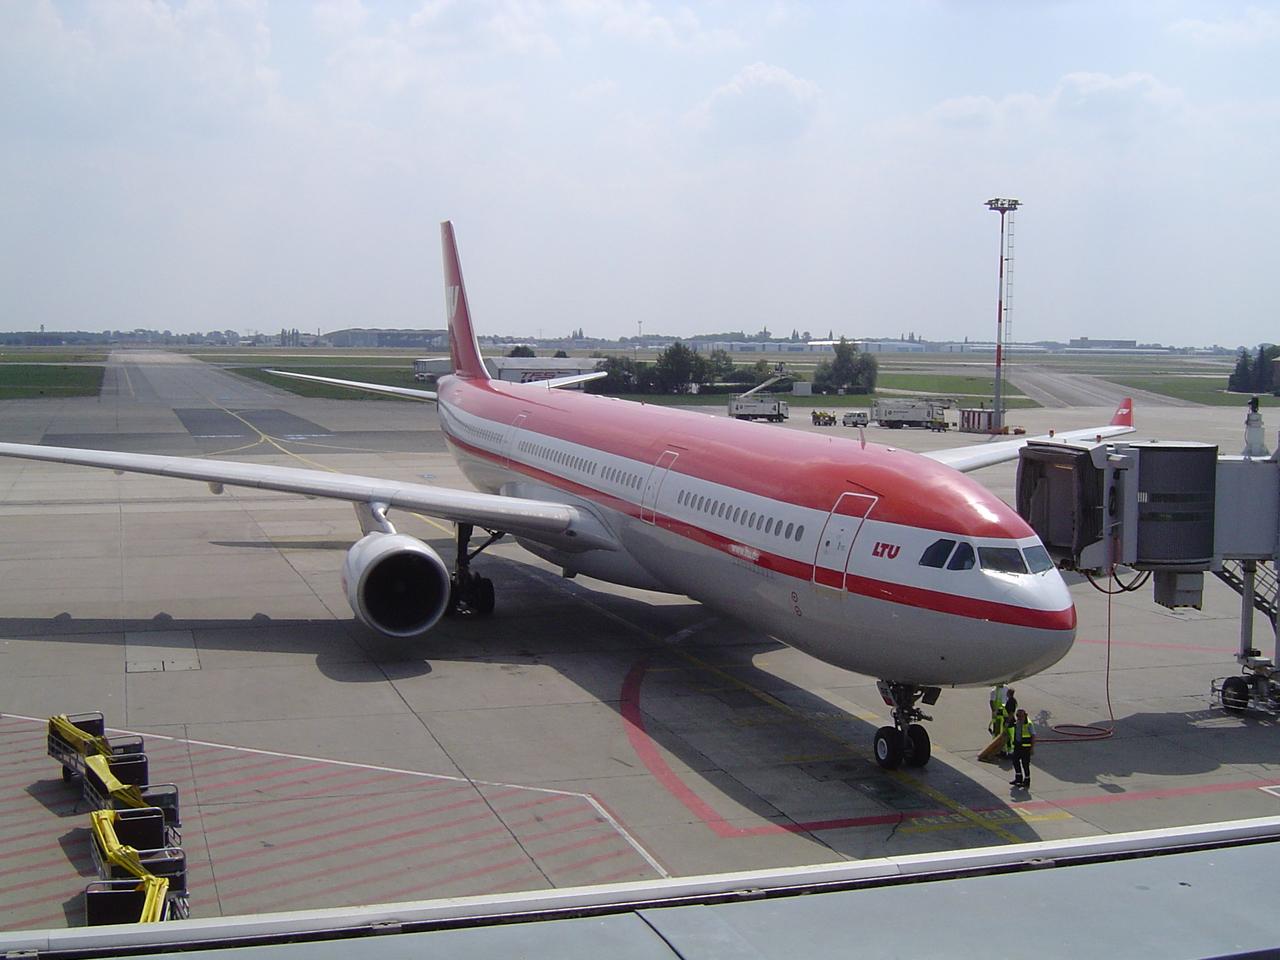 airbusa330-300ltuamgalsjiv.jpg